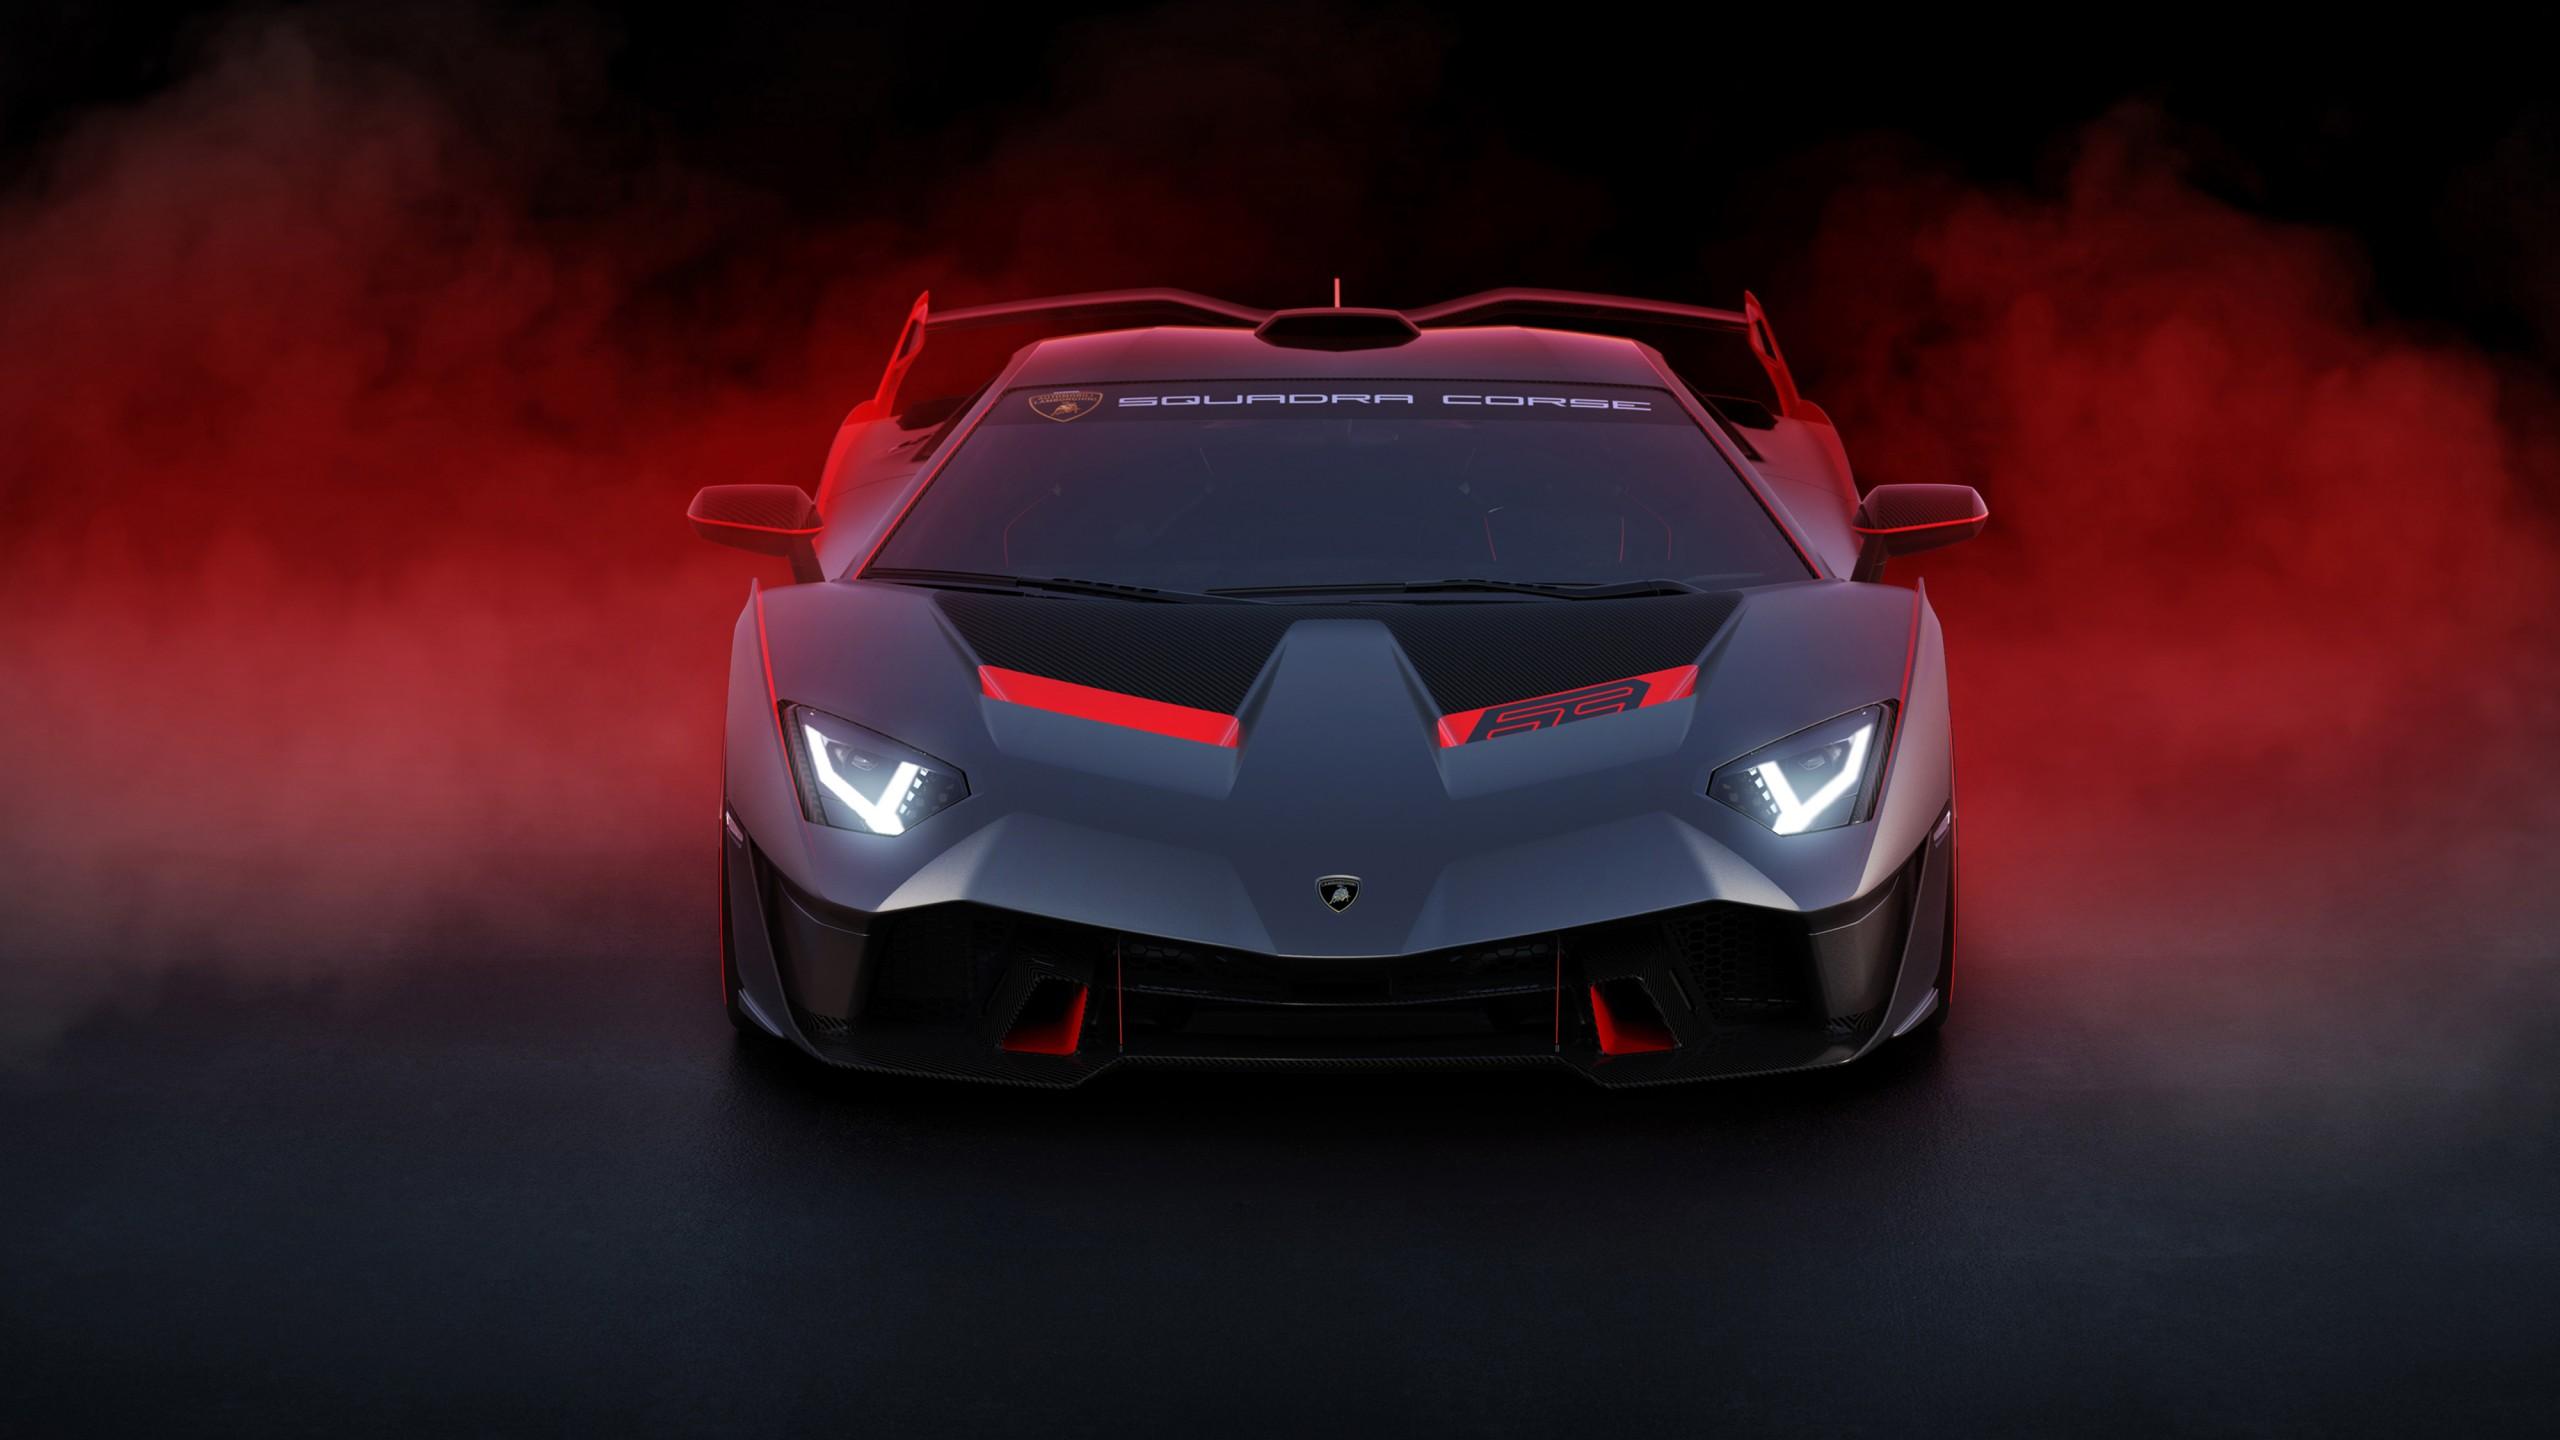 Lamborghini sc18 2019 4k 7 wallpaper hd car wallpapers id 11559 - Image de cars ...